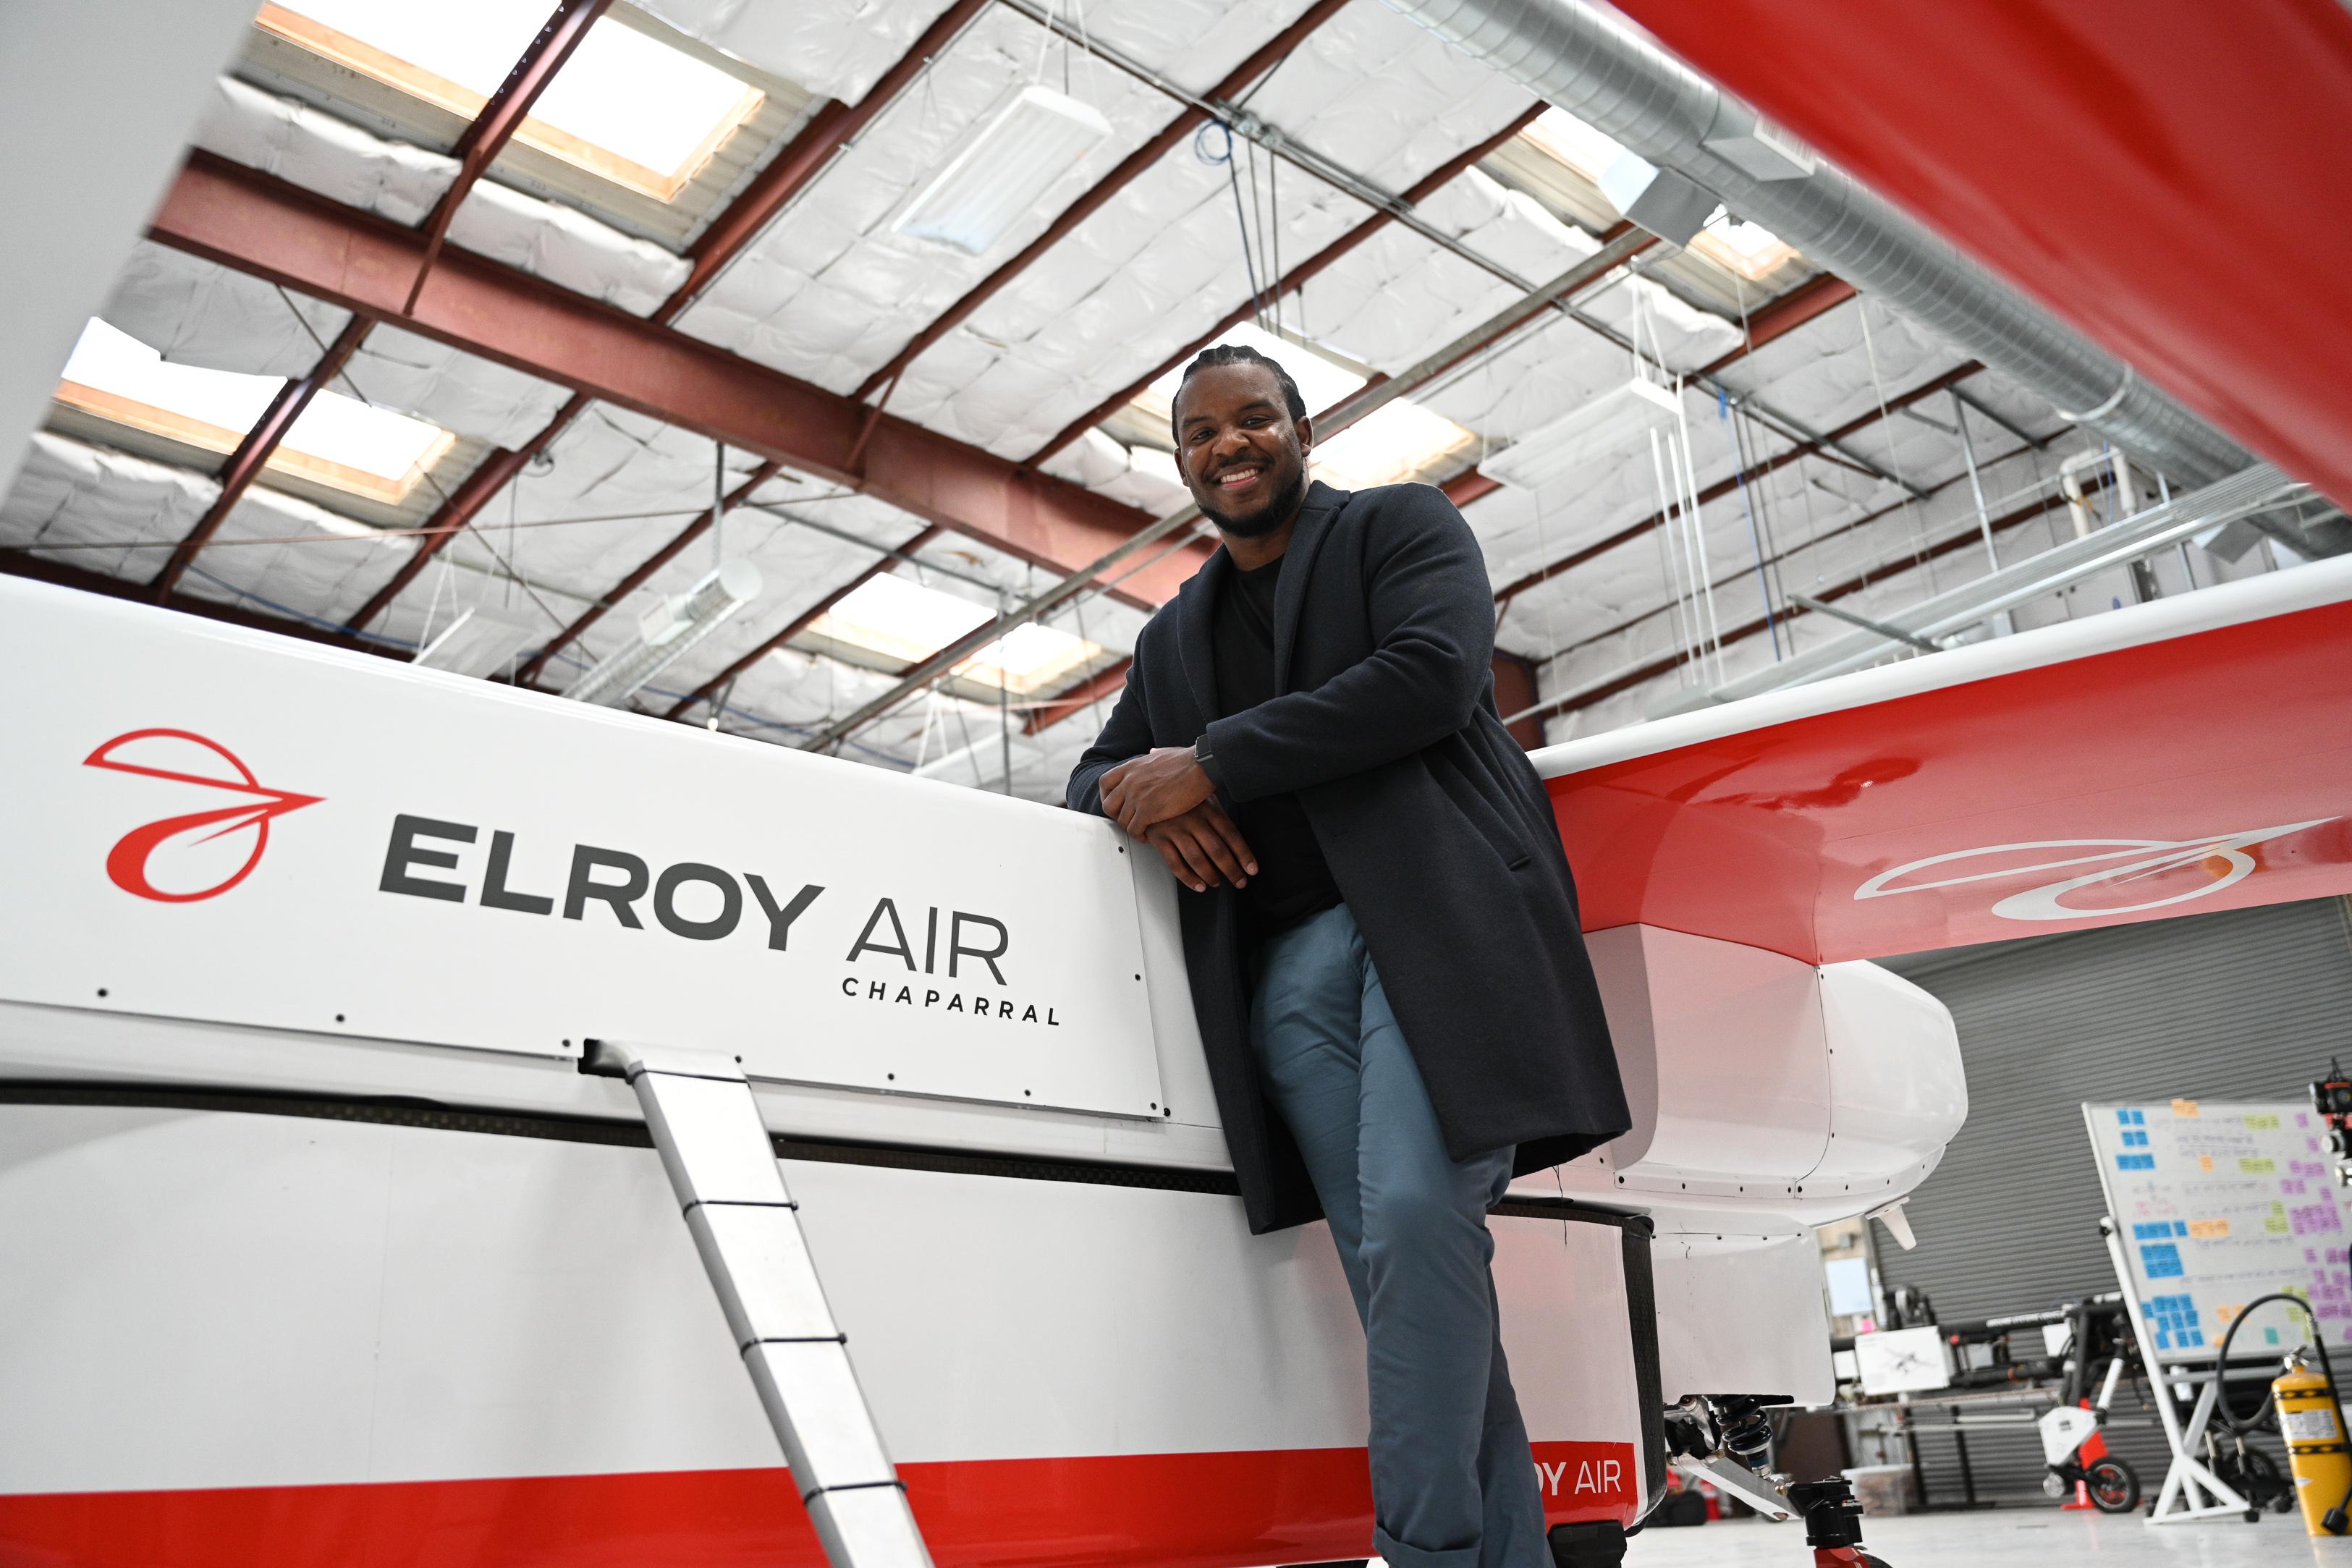 Kofi Asante standing beside the new Chaparral aircraft